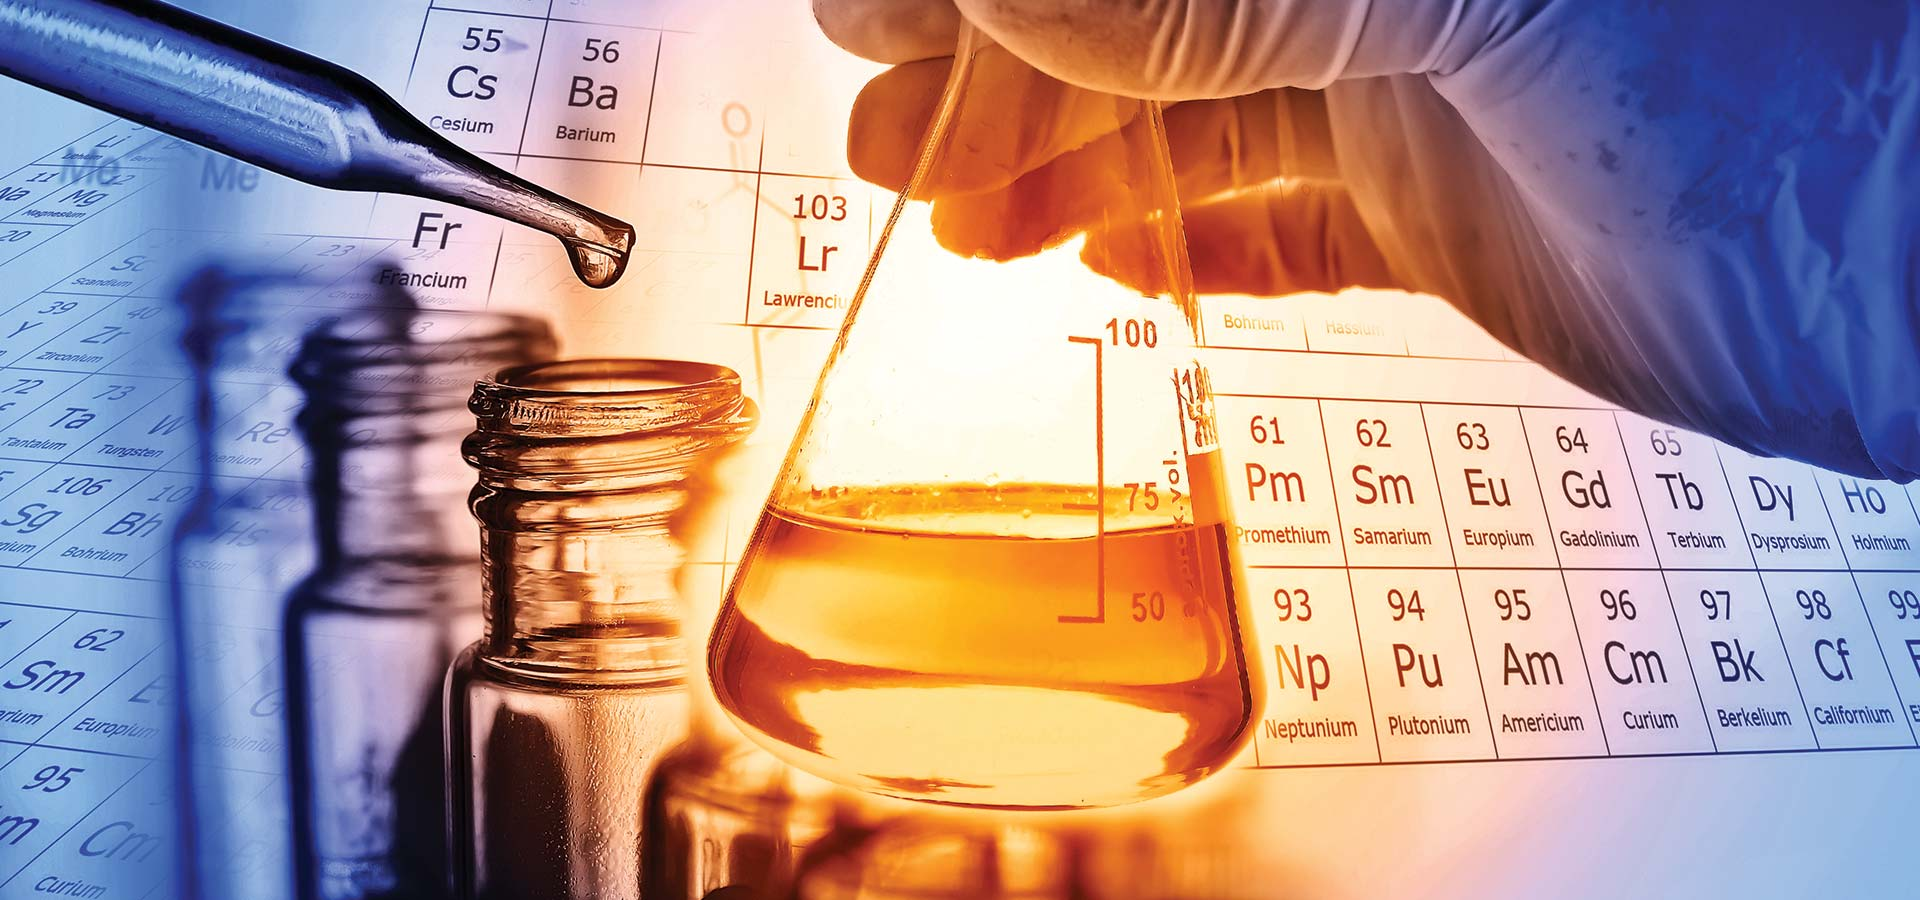 Fyrquel - Oil Additives